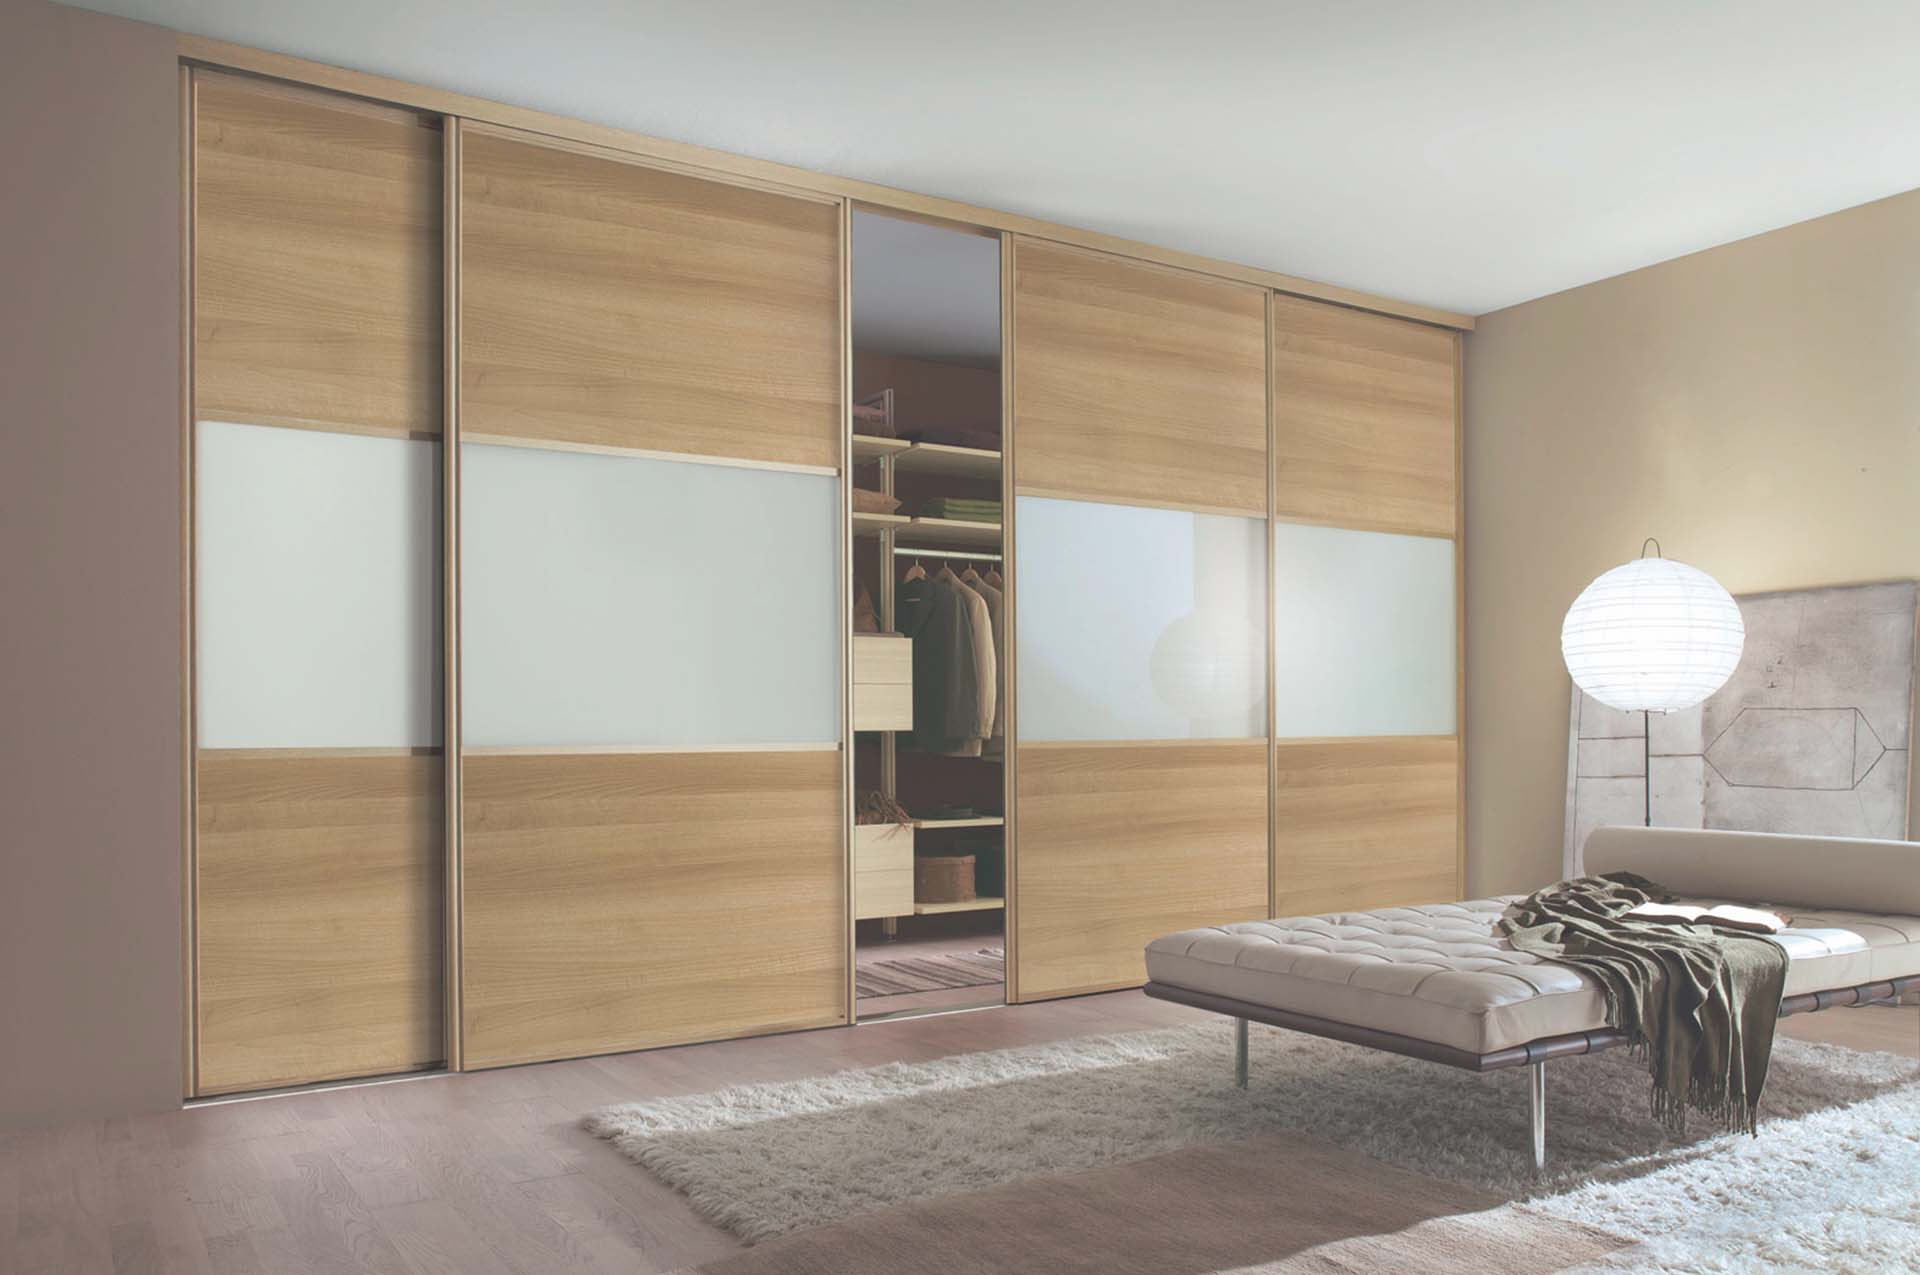 genunie gliderobes wardrobe doors bespoke sliding door. Black Bedroom Furniture Sets. Home Design Ideas